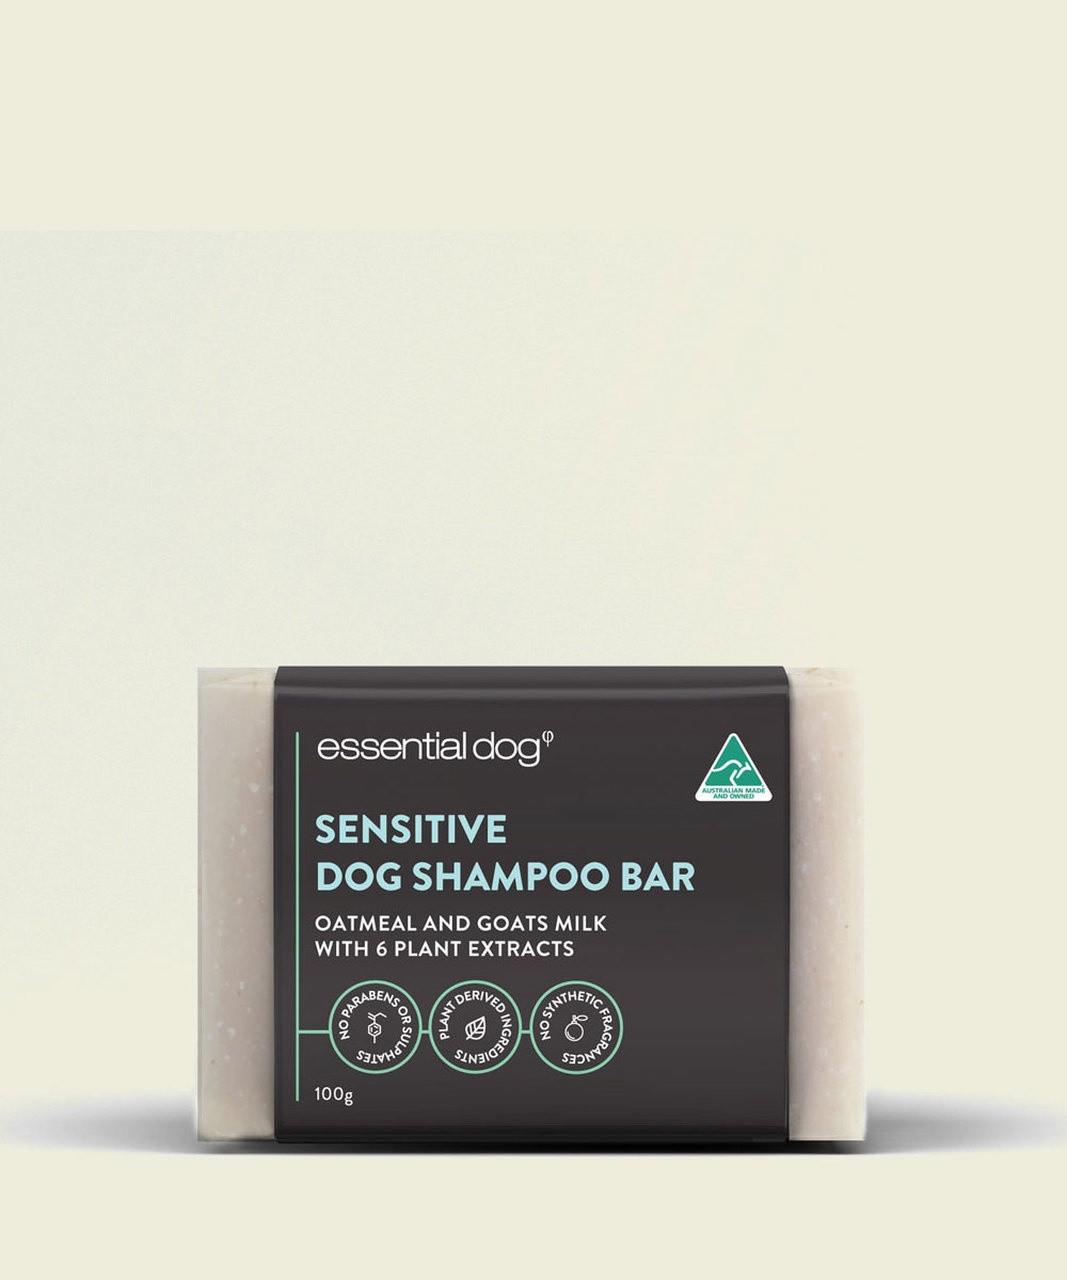 Essential Dog Solid Dog Shampoo Bar (Sensitive): Oatmeal, Lavender & Geranium